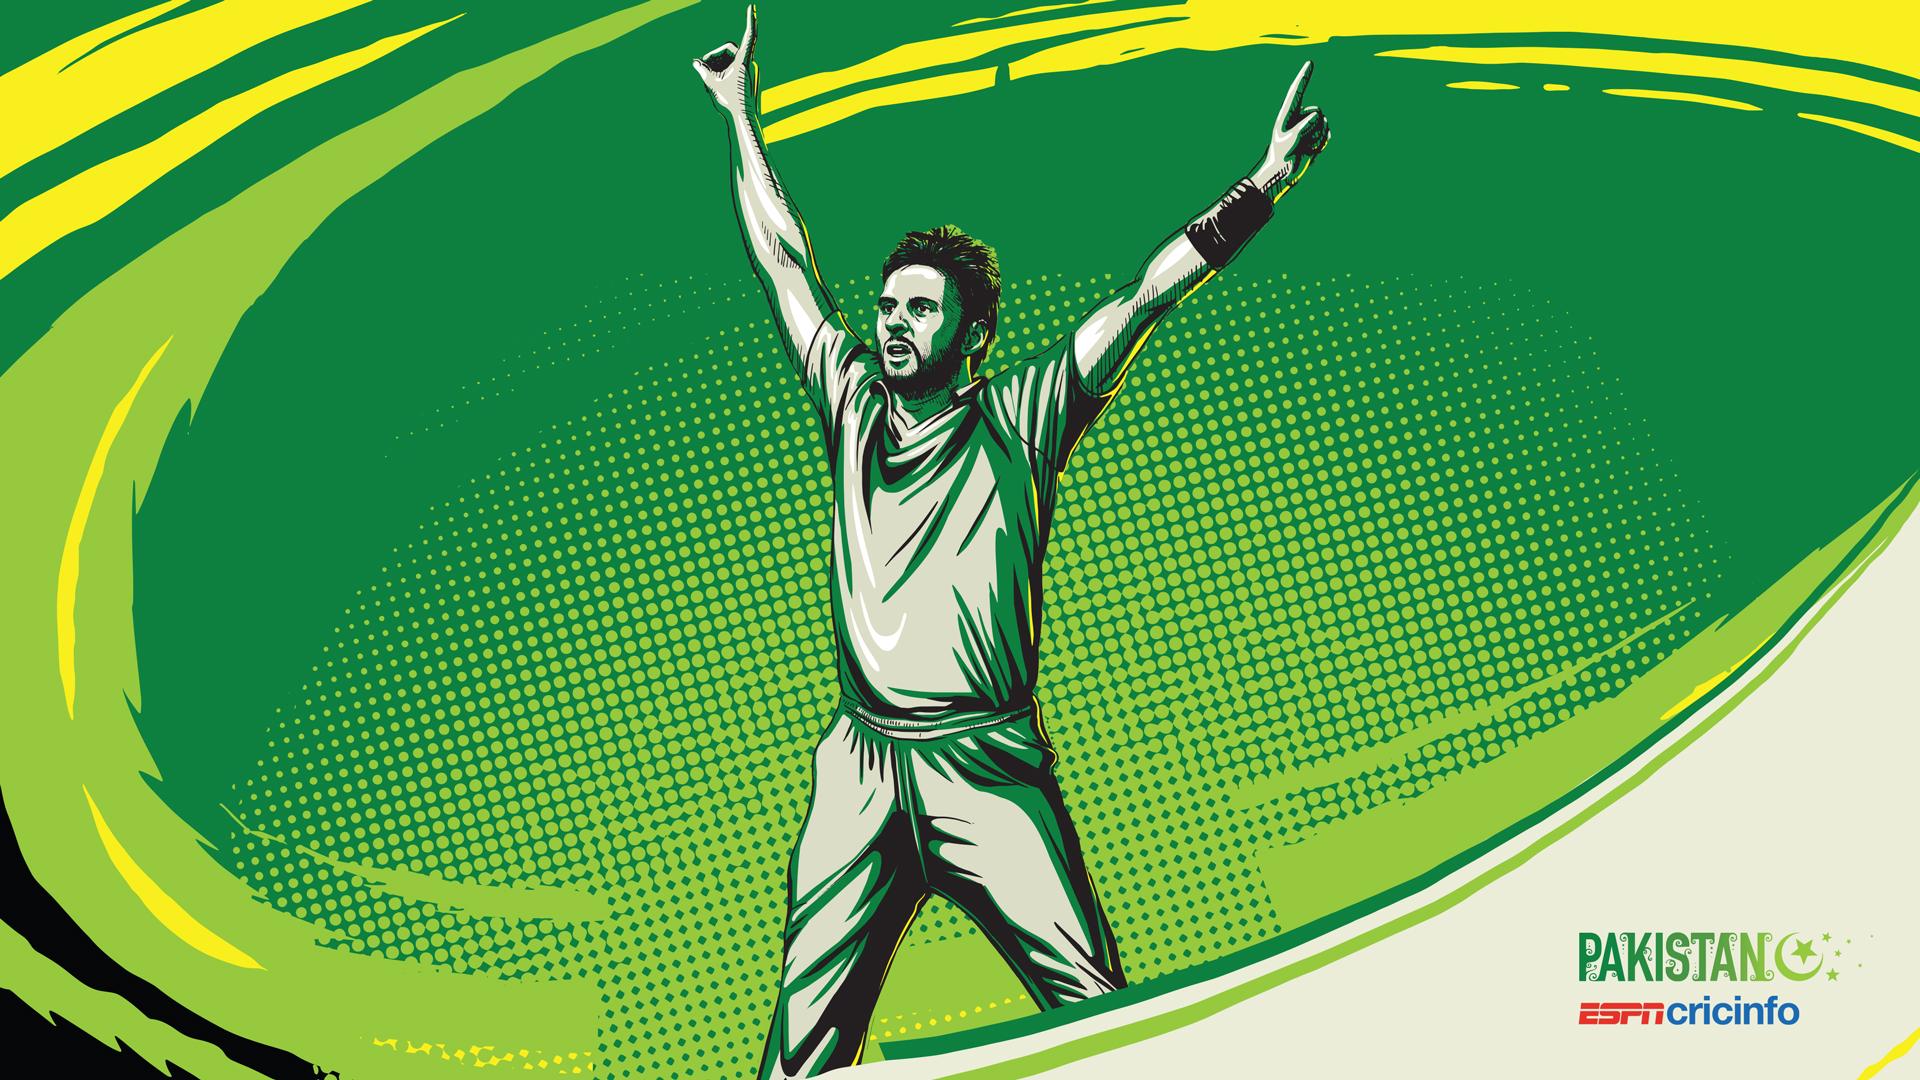 World Cup Pakistan Cricket Wallpapers Espncricinfocom